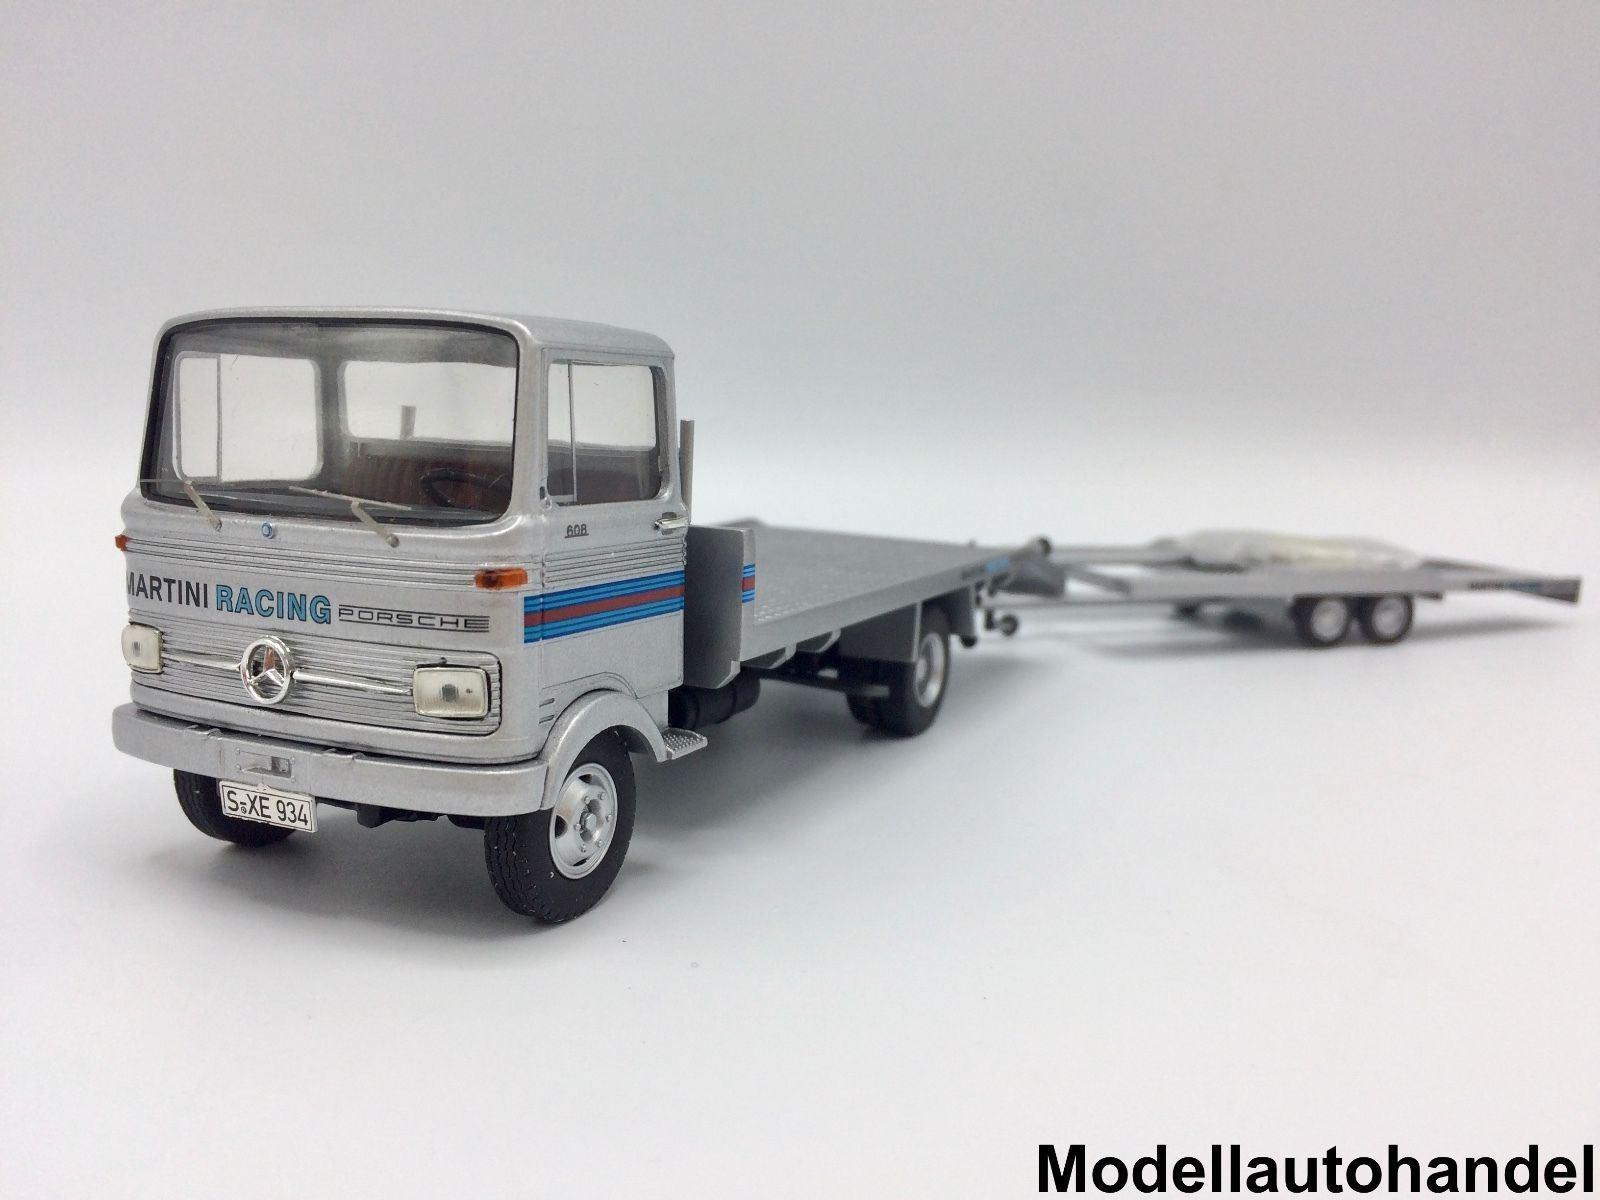 Mercedes LP 608 camiones + porsche martini tráiler-argento -1 43 premium classixxs